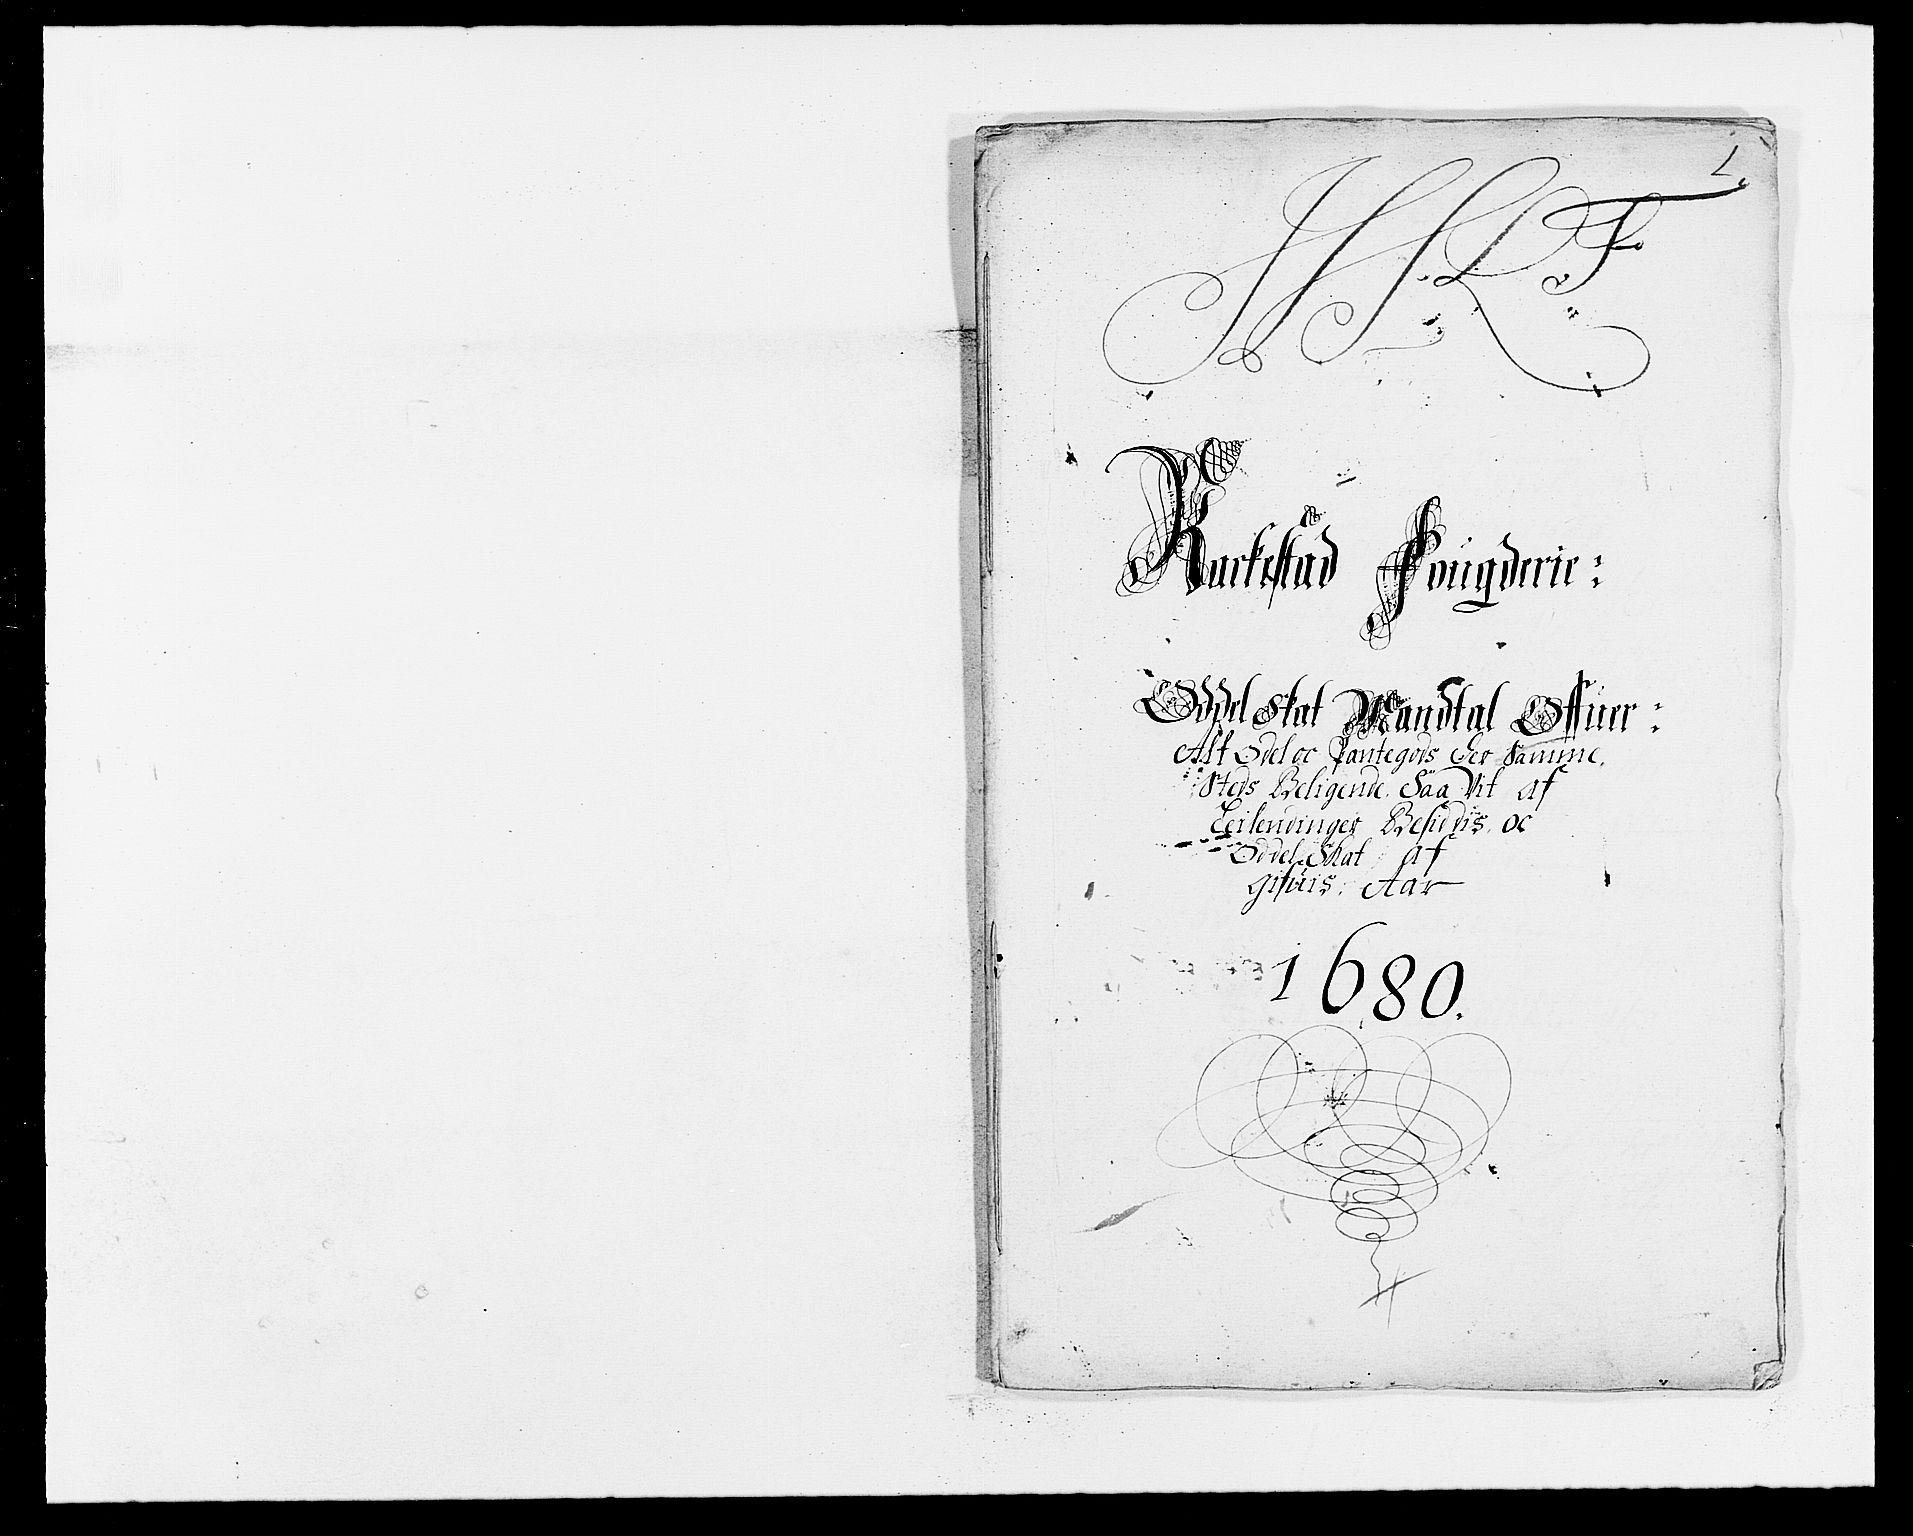 RA, Rentekammeret inntil 1814, Reviderte regnskaper, Fogderegnskap, R05/L0272: Fogderegnskap Rakkestad, 1680-1681, s. 164